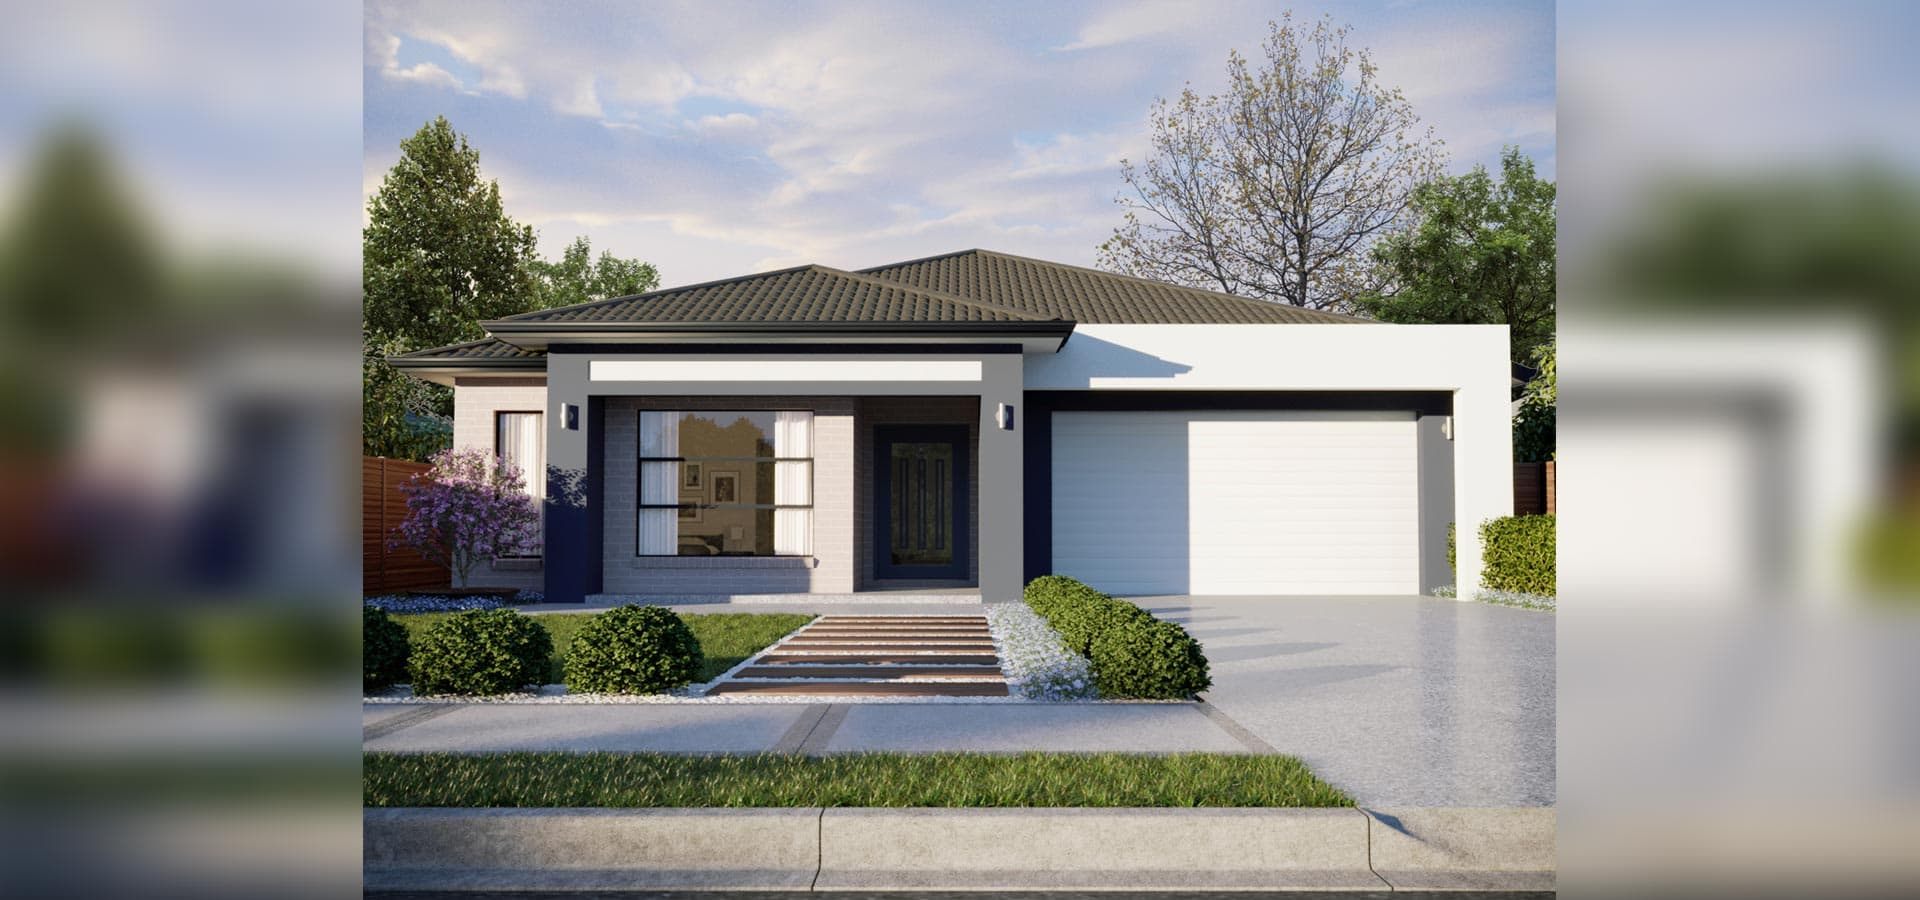 Campanula-Single-House-Design updated